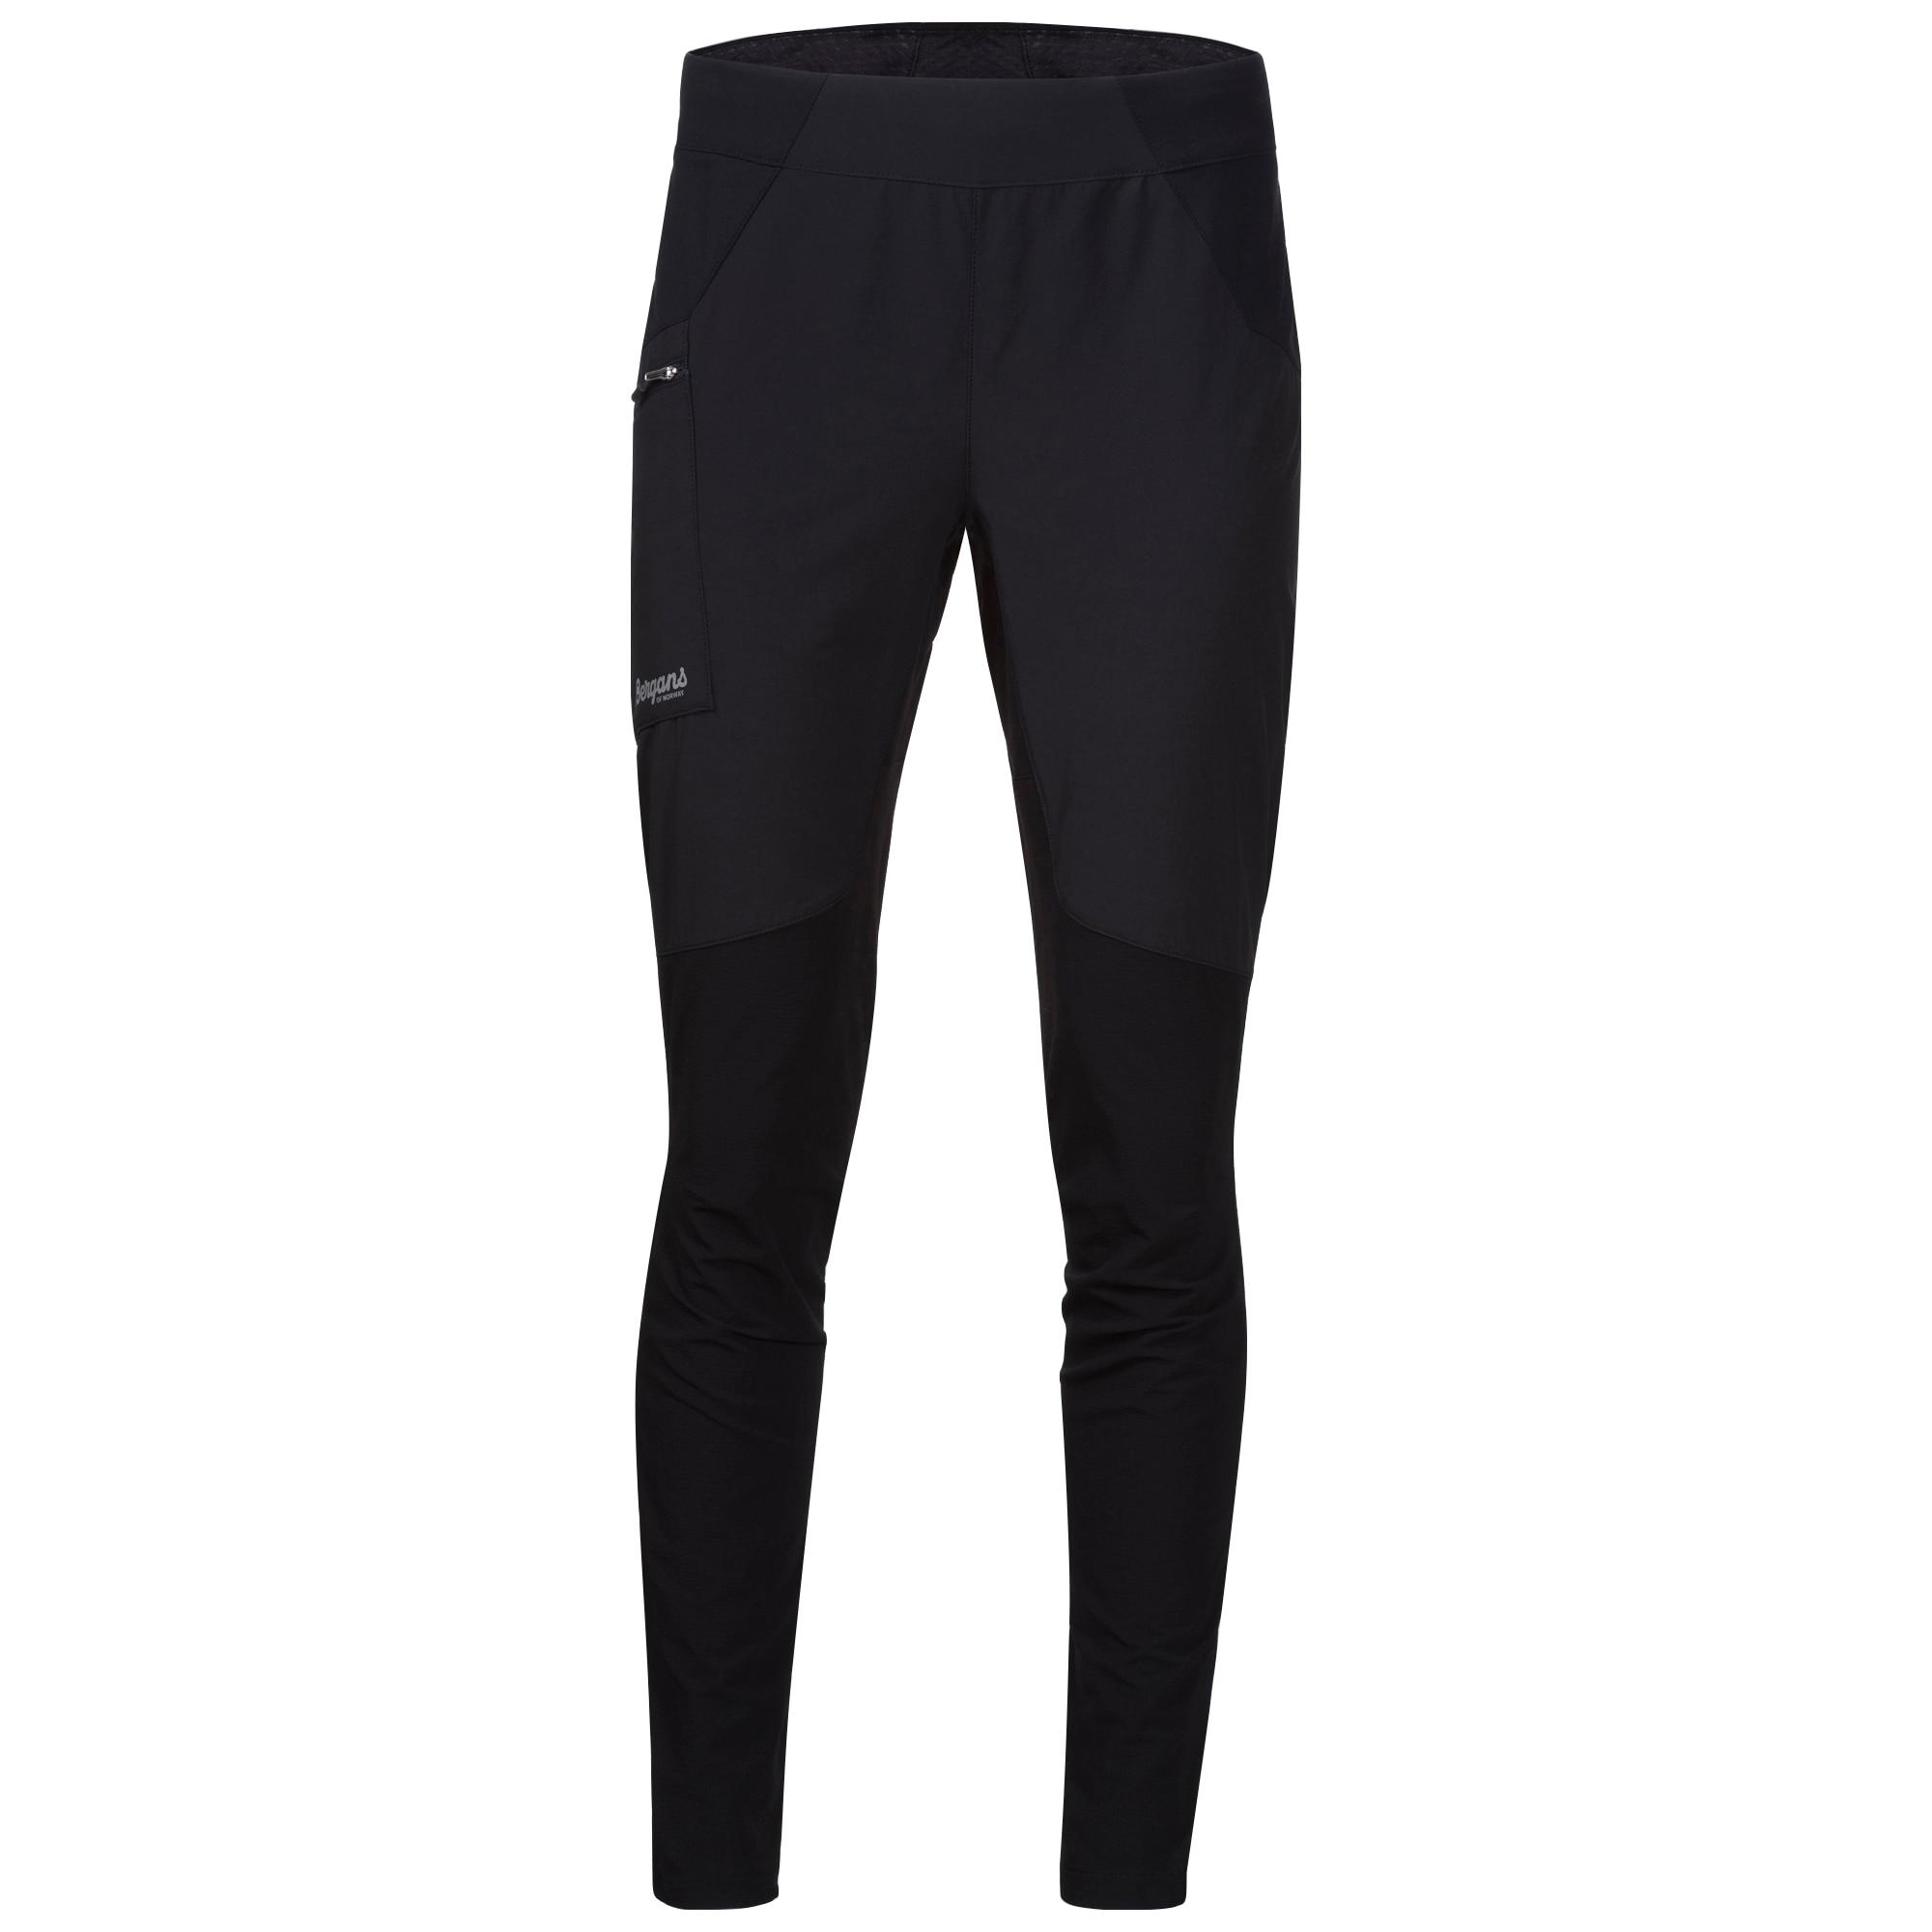 Romsdal Tight W Pants